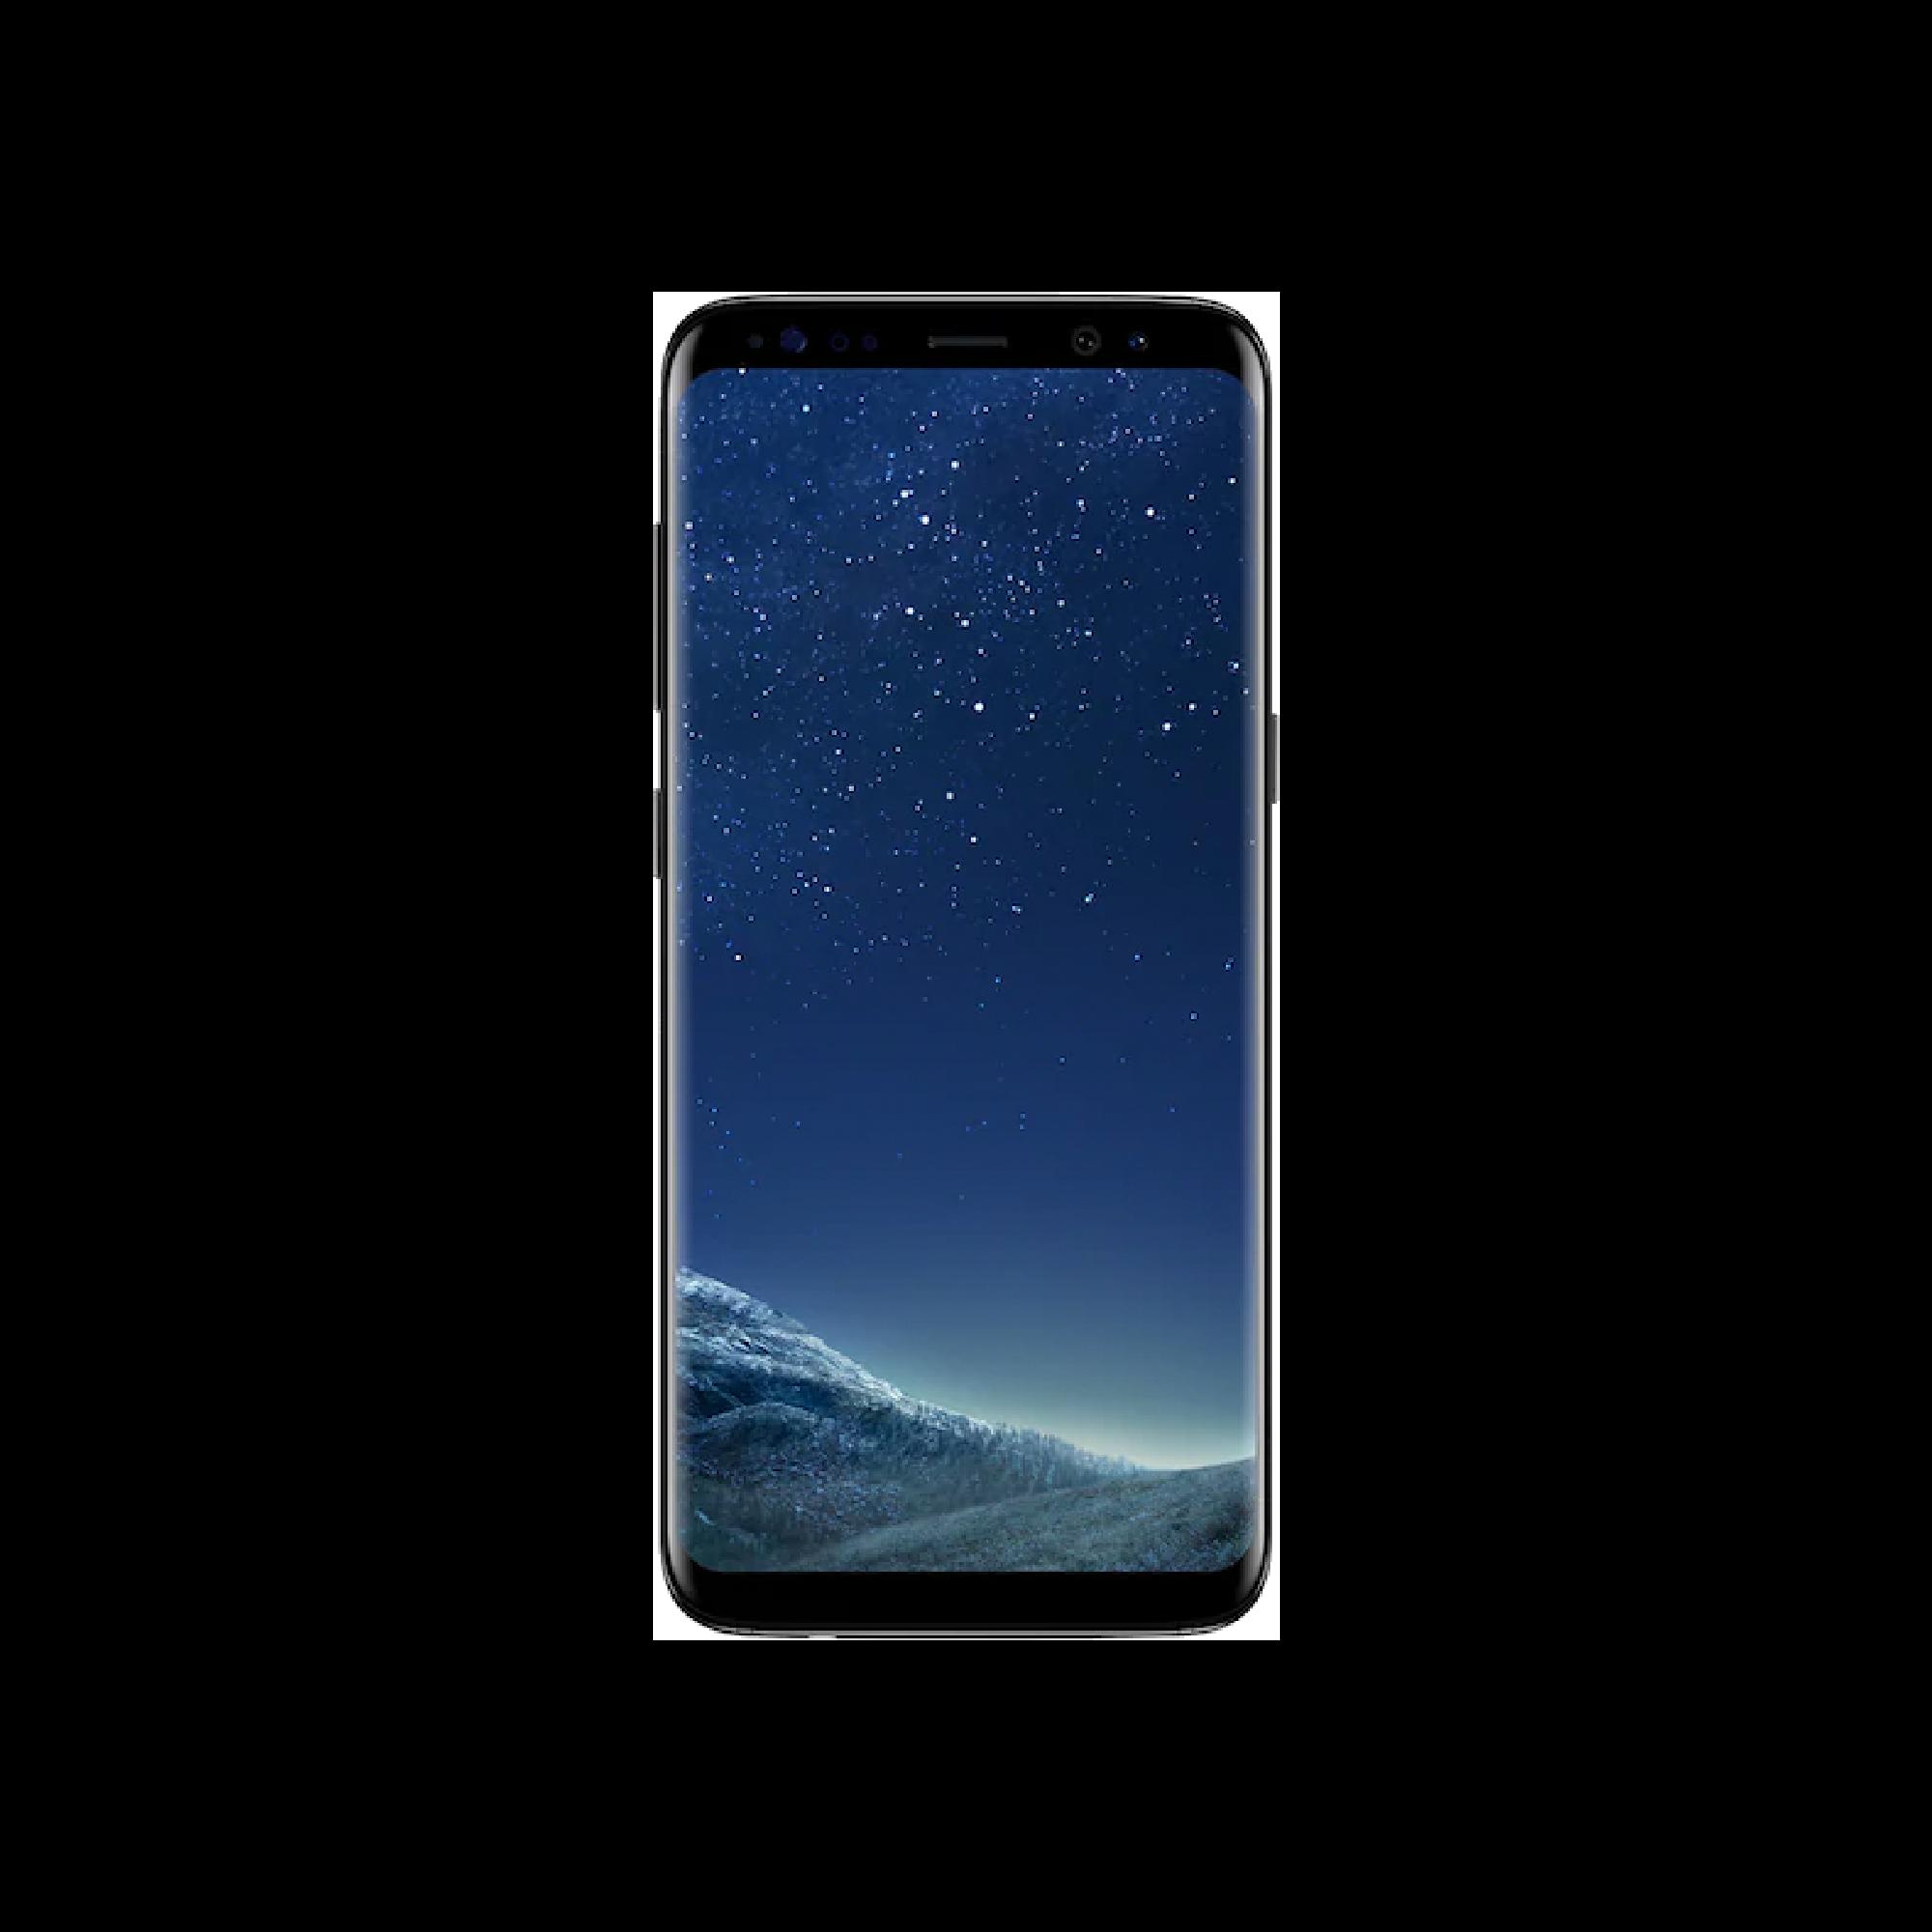 Samsung S8 | $269 + tax